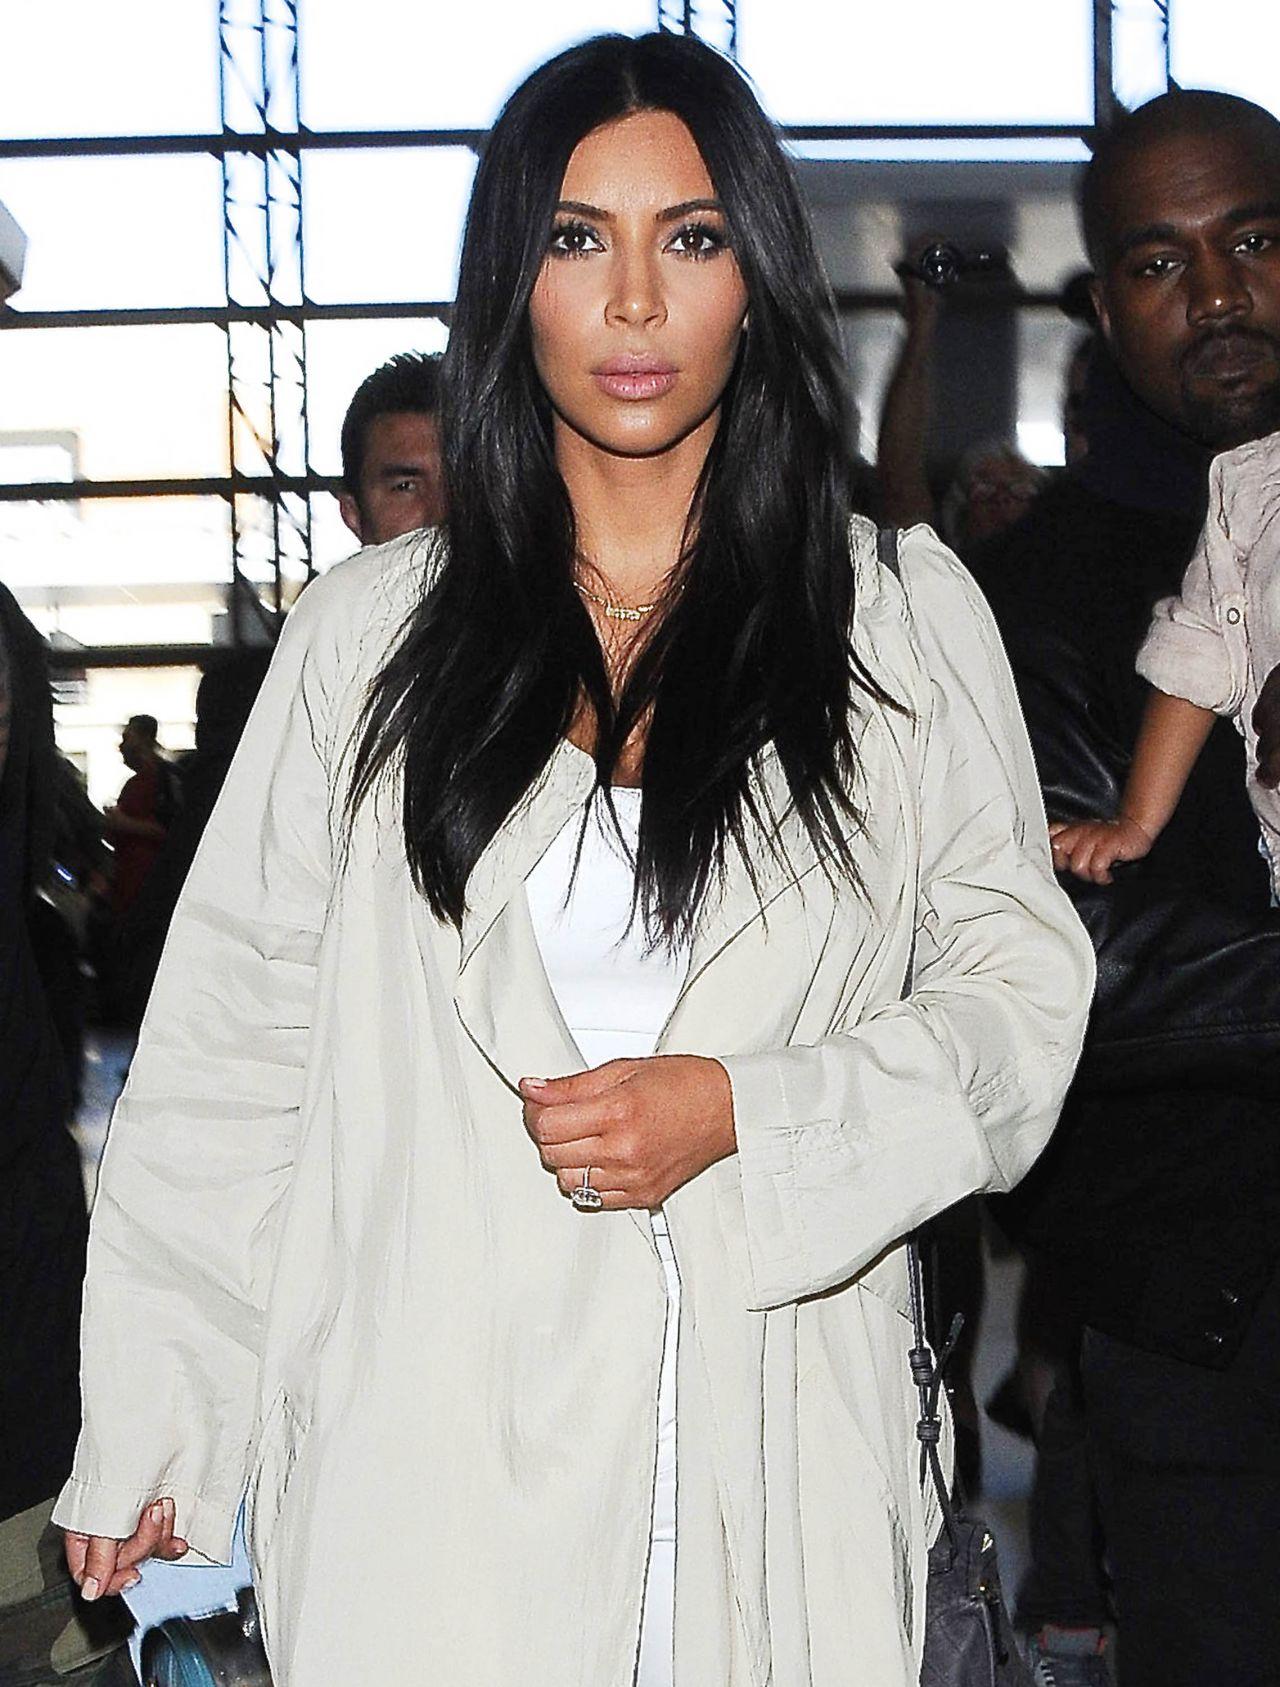 Kim Kardashian at LAX Airport in Los Angeles, April 2015